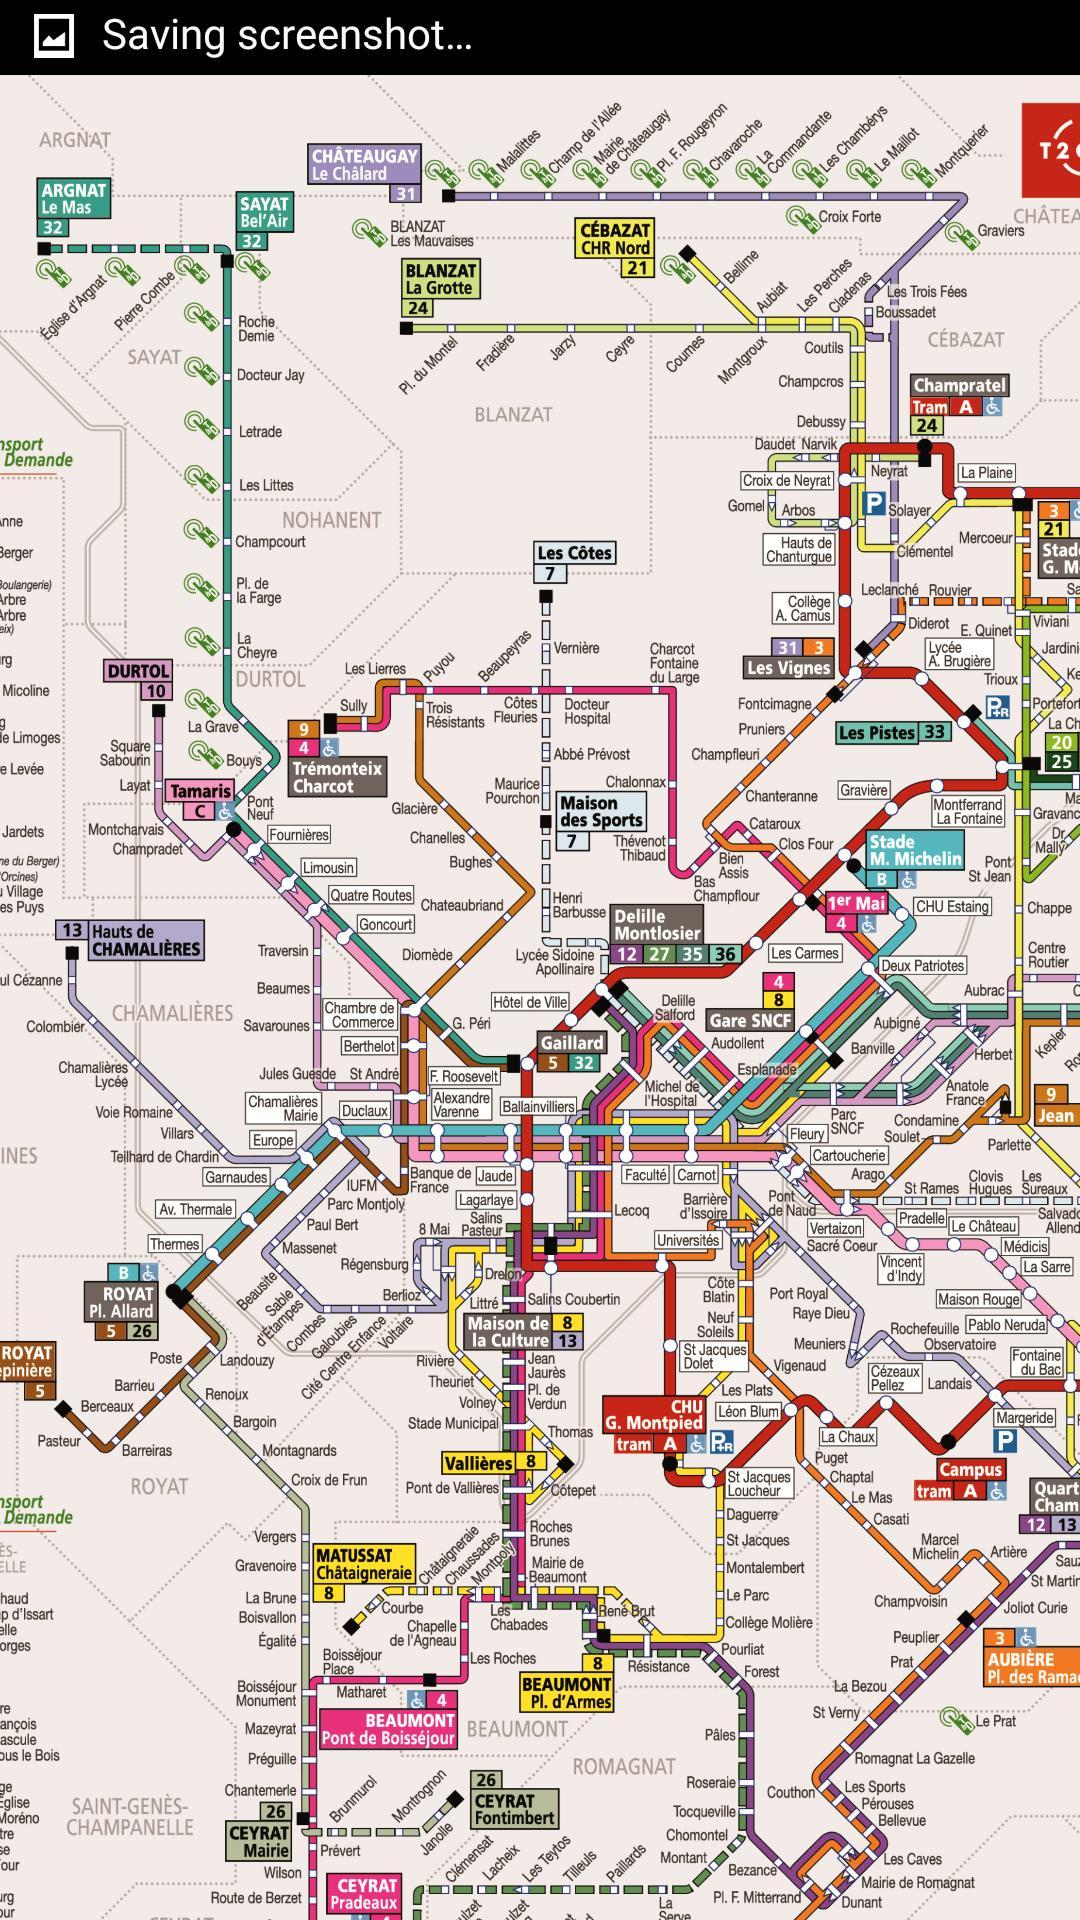 Clermont-Ferrand Tram, Bus Map for Android - APK Download on council of clermont map, munich map, saumur map, newcastle upon tyne map, le havre map, utrecht map, carcassonne map, london map, trieste map, cluj-napoca map, mont saint-michel map, boulogne-sur-mer map, seine map, rennes map, cahors map, vila nova de gaia map, turku map, arras map, evian-les-bains map, strasbourg map,